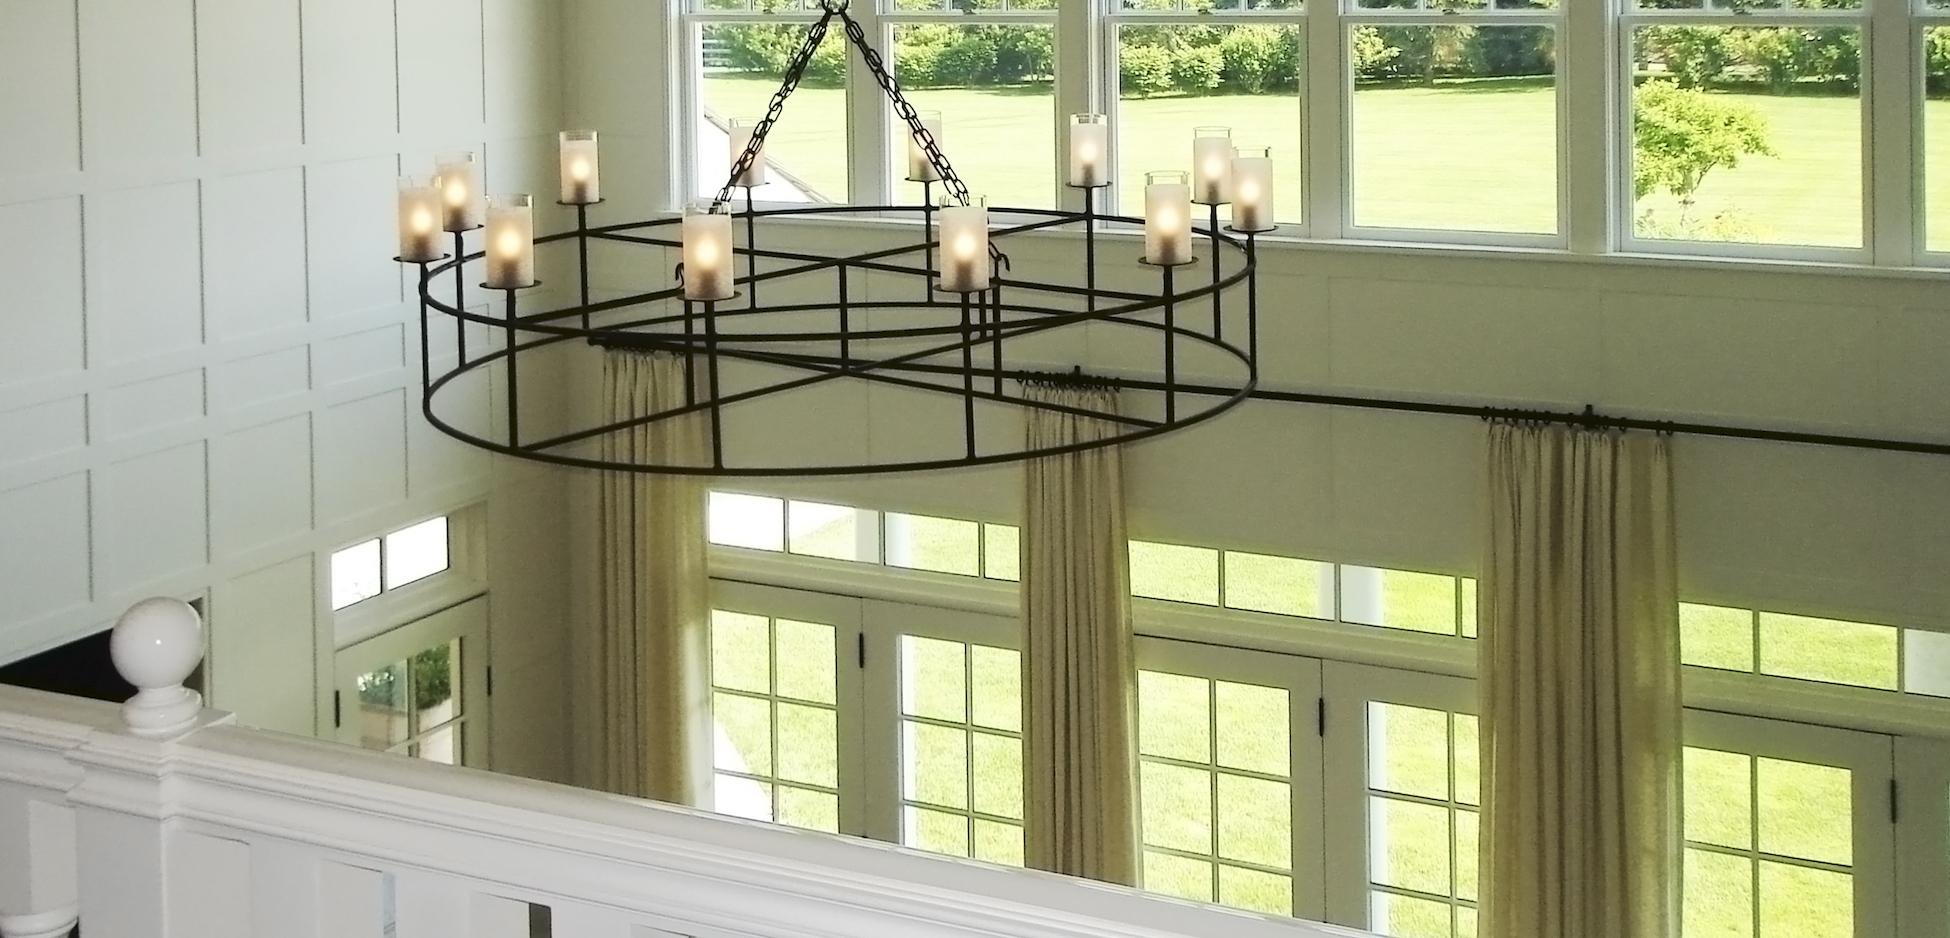 BOK-Architect-Hamptons-7 cropped